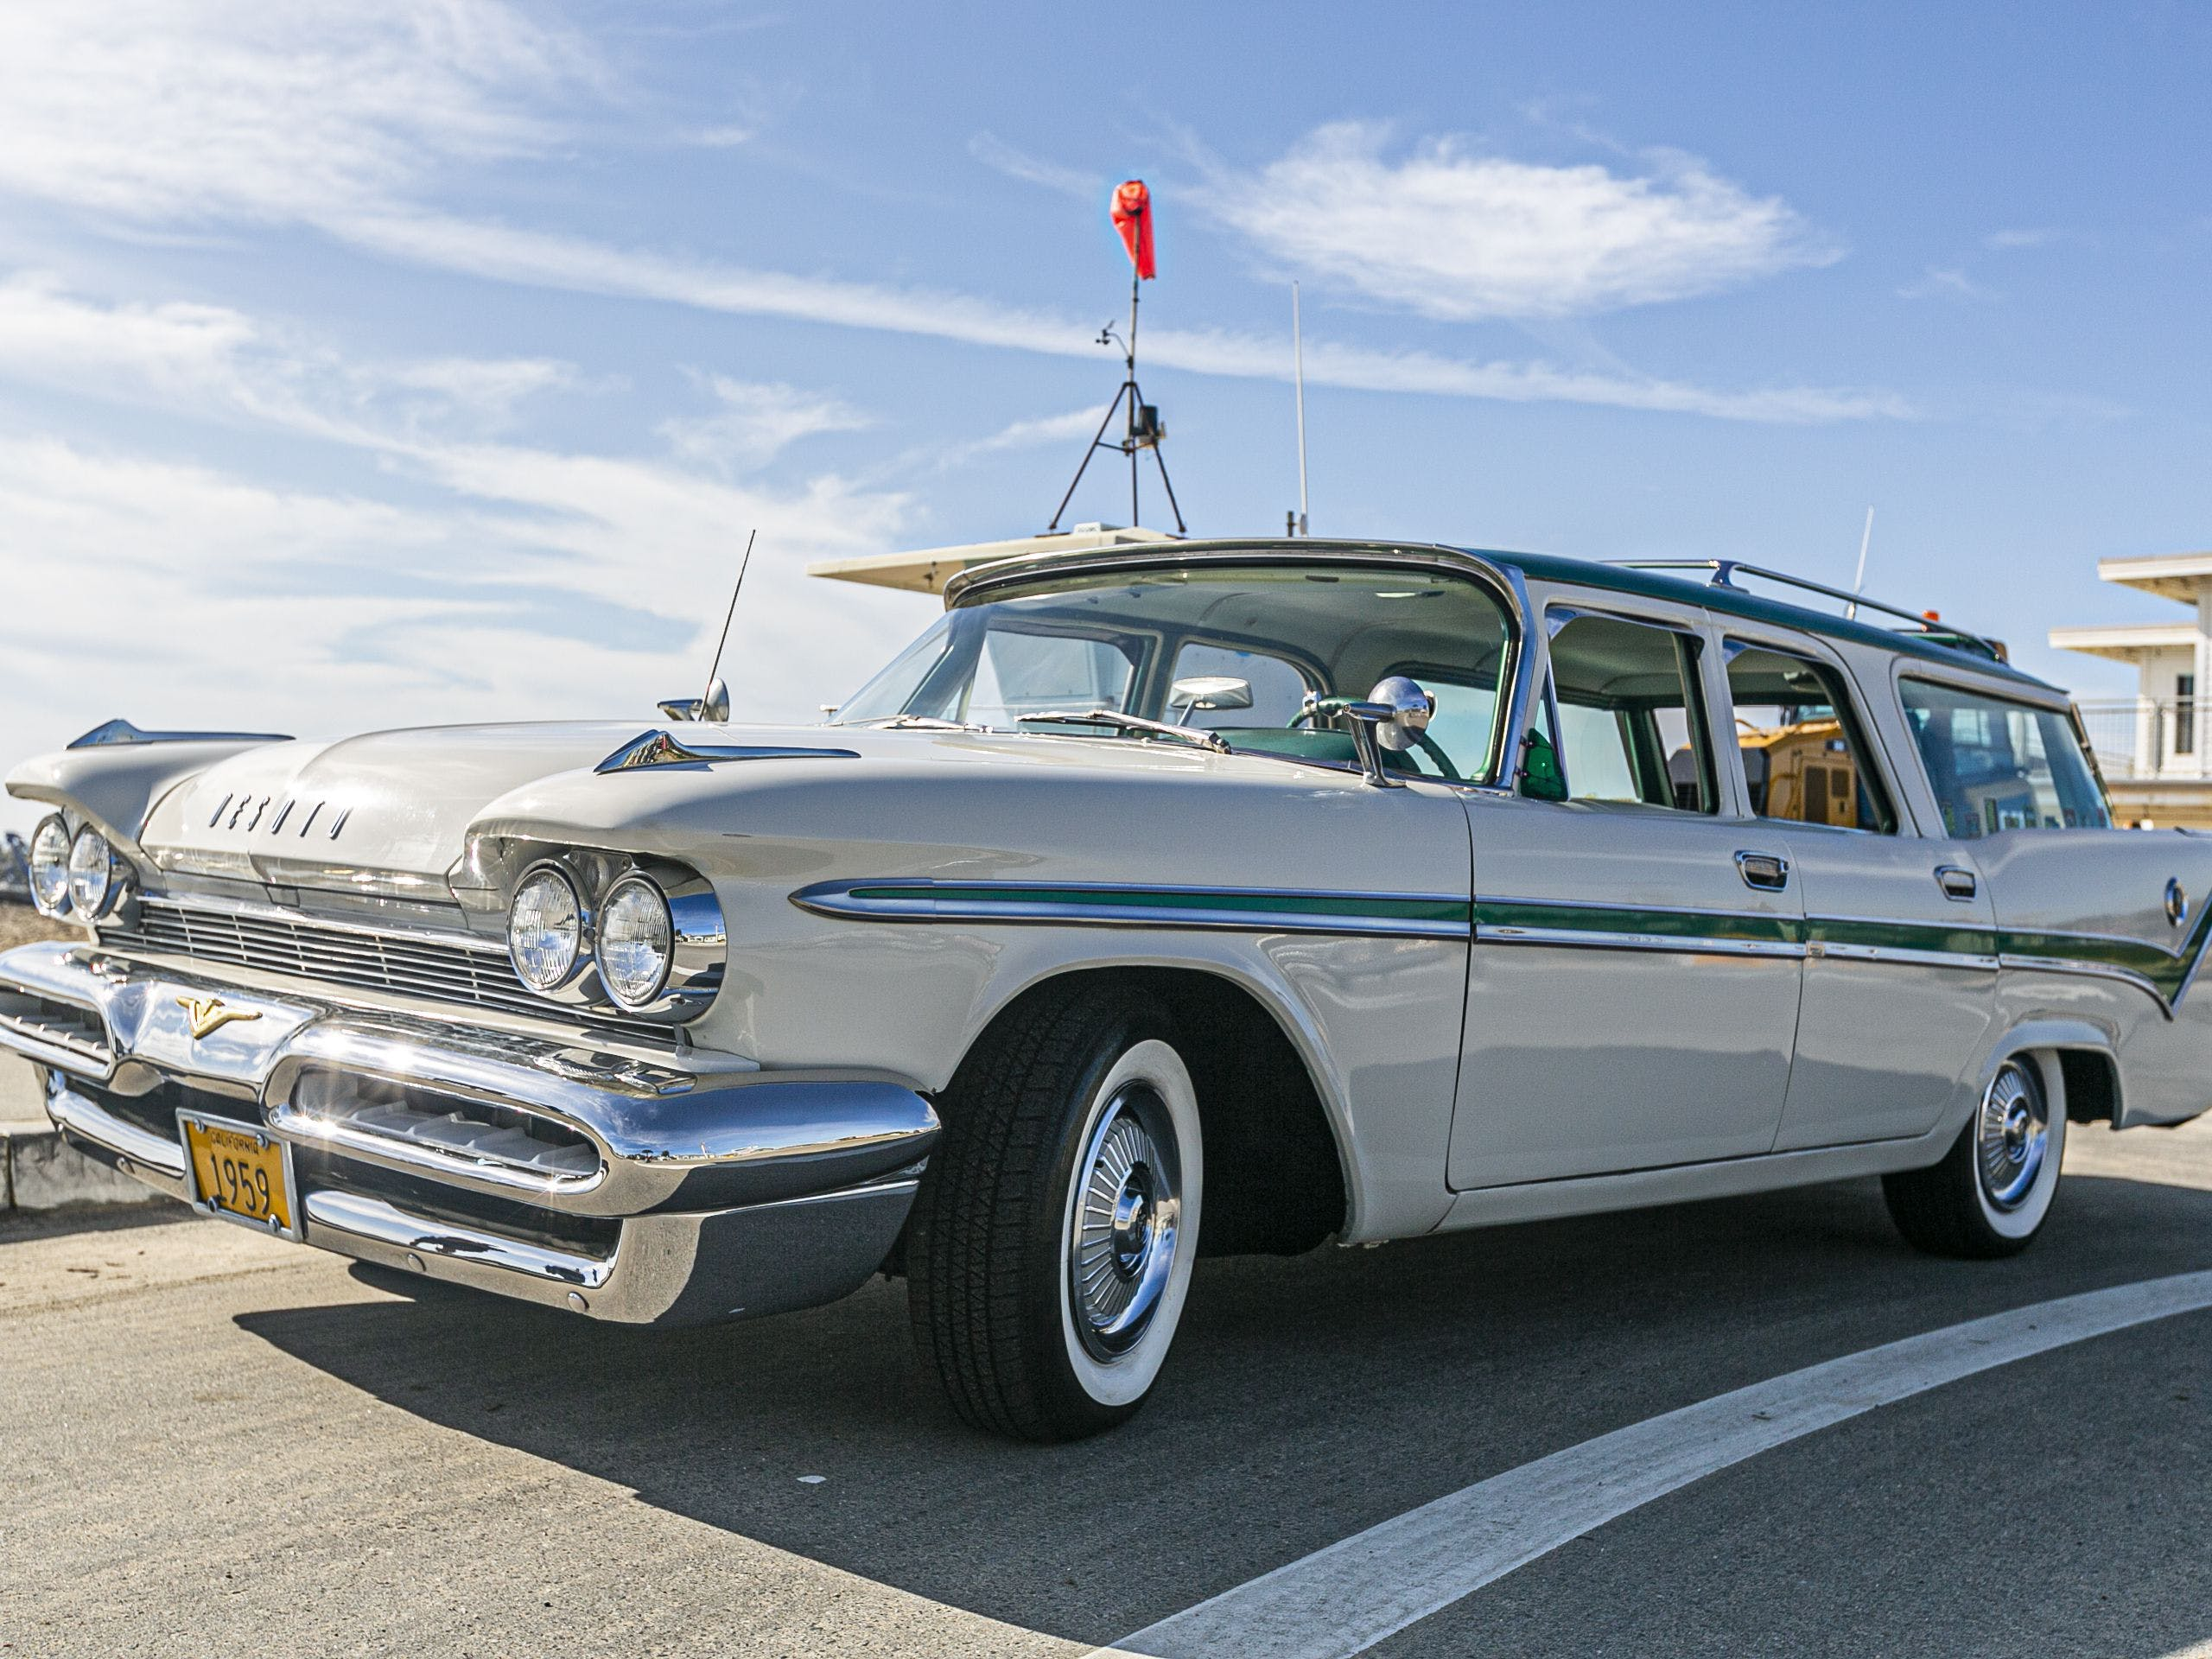 1959 De Soto Firesweep Explorer Nine-Passenger Wagon